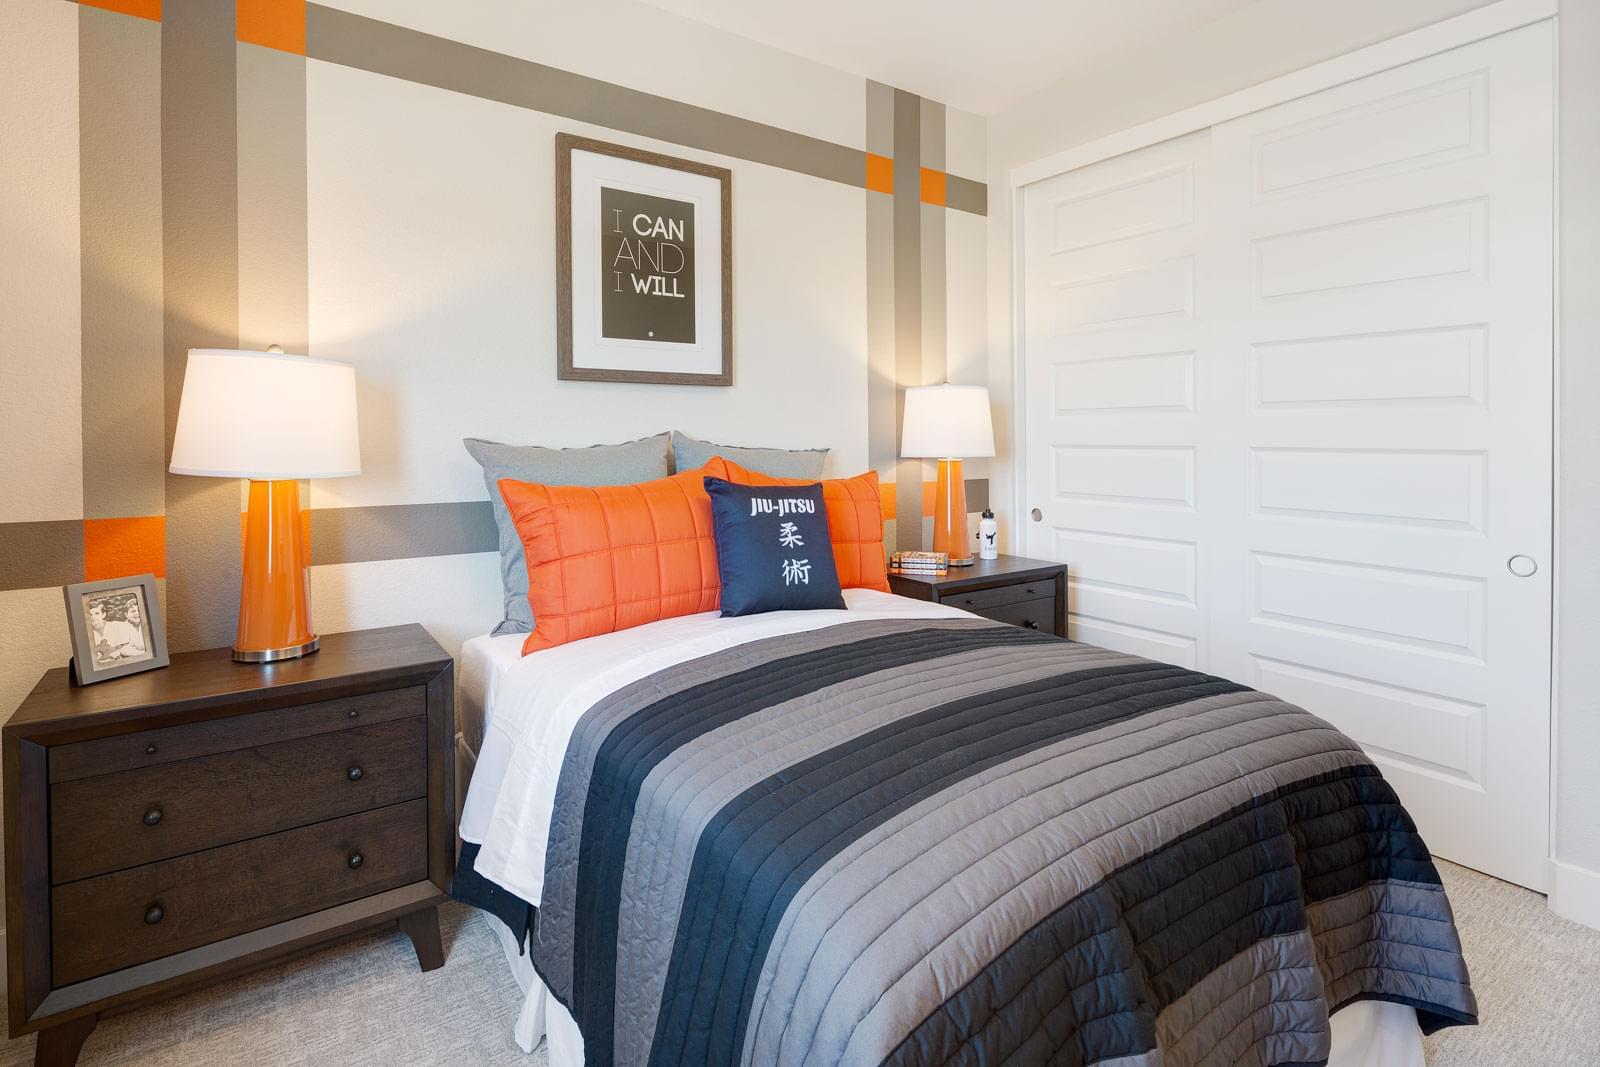 Residence 4 Bedroom 2